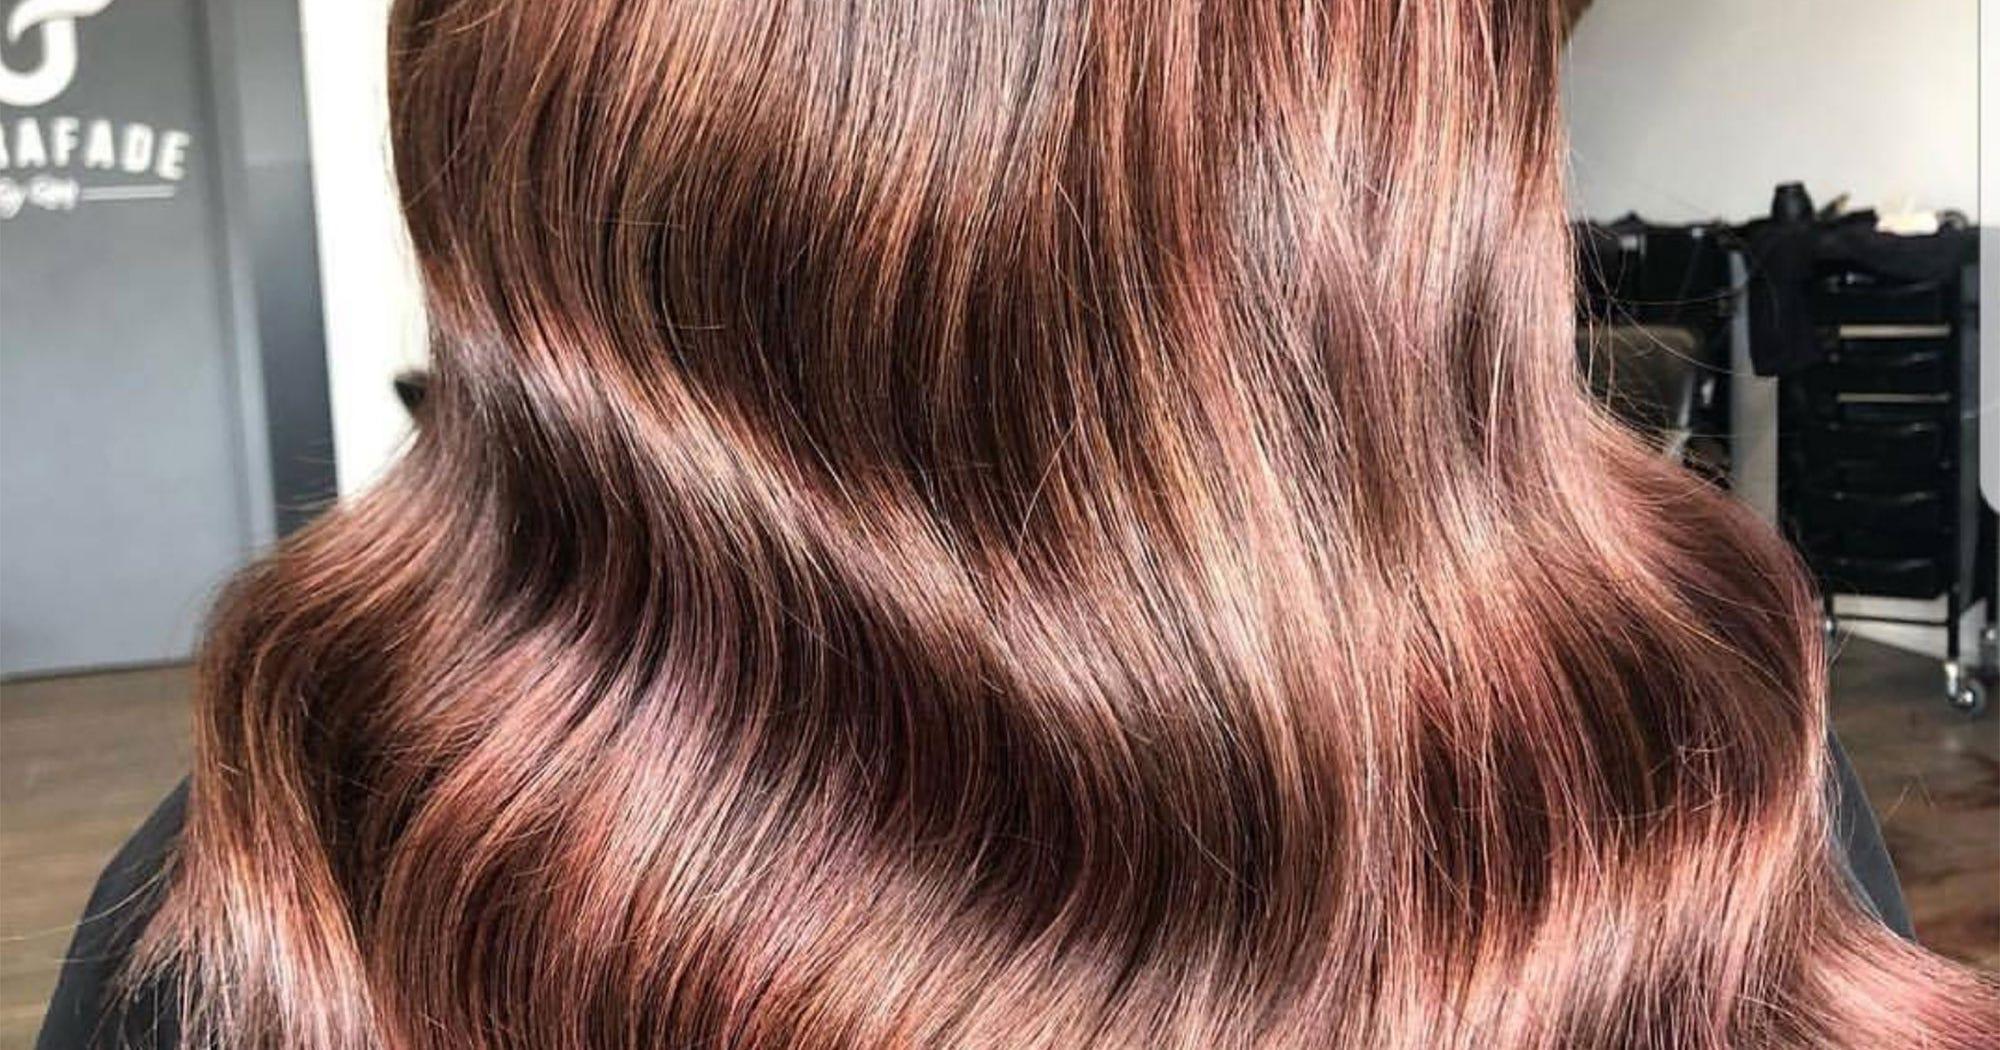 Rose Brown Spring Hair Color Trend For Brunettes